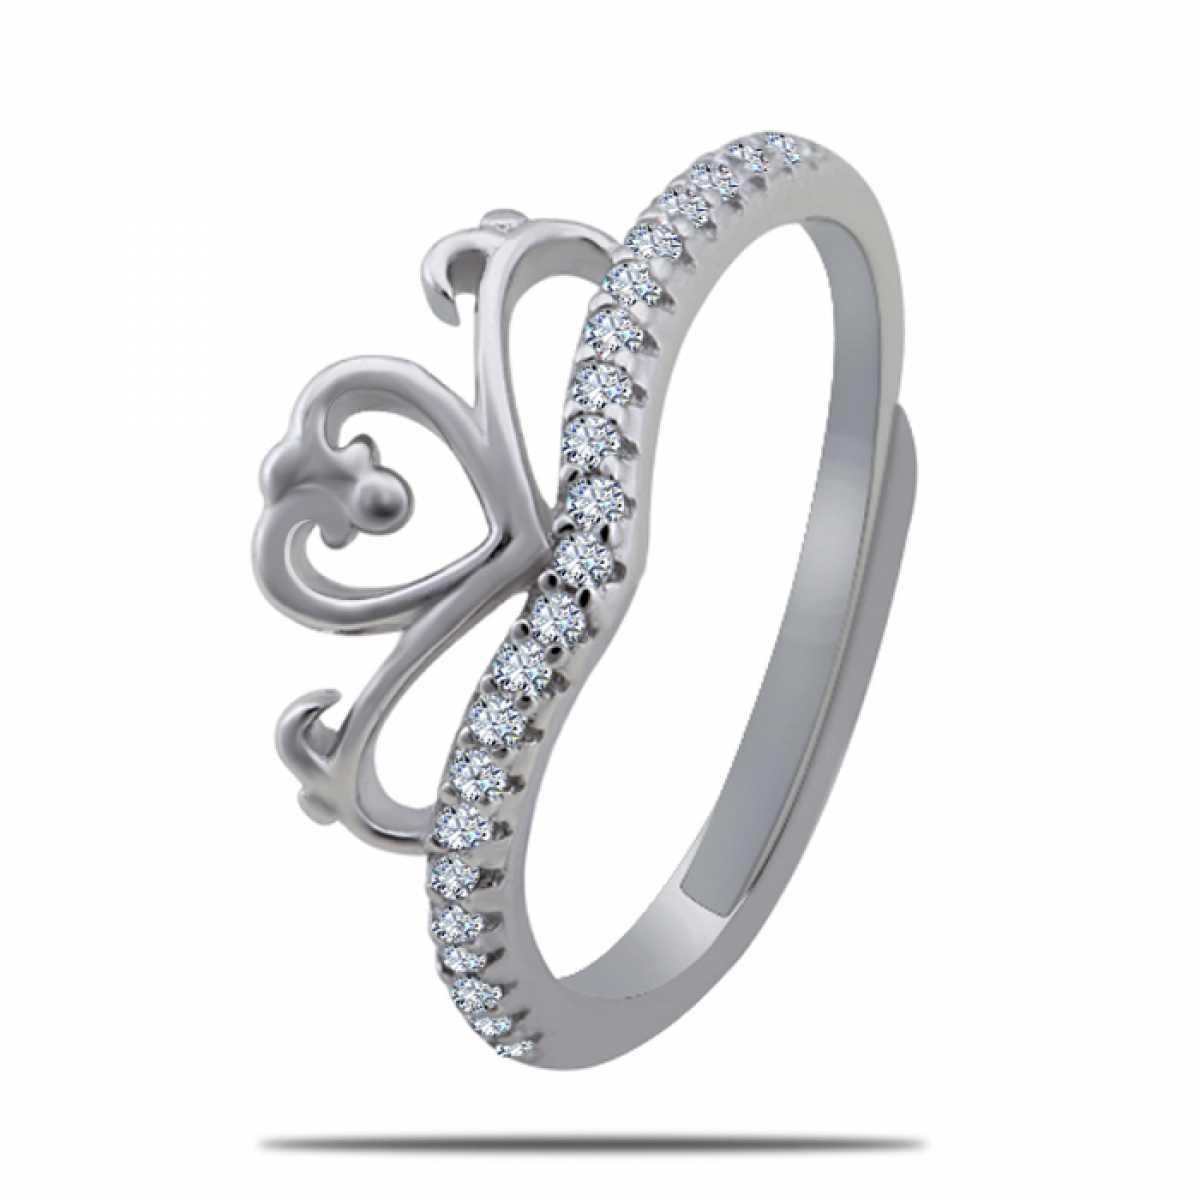 Queen Heart Silver Ring